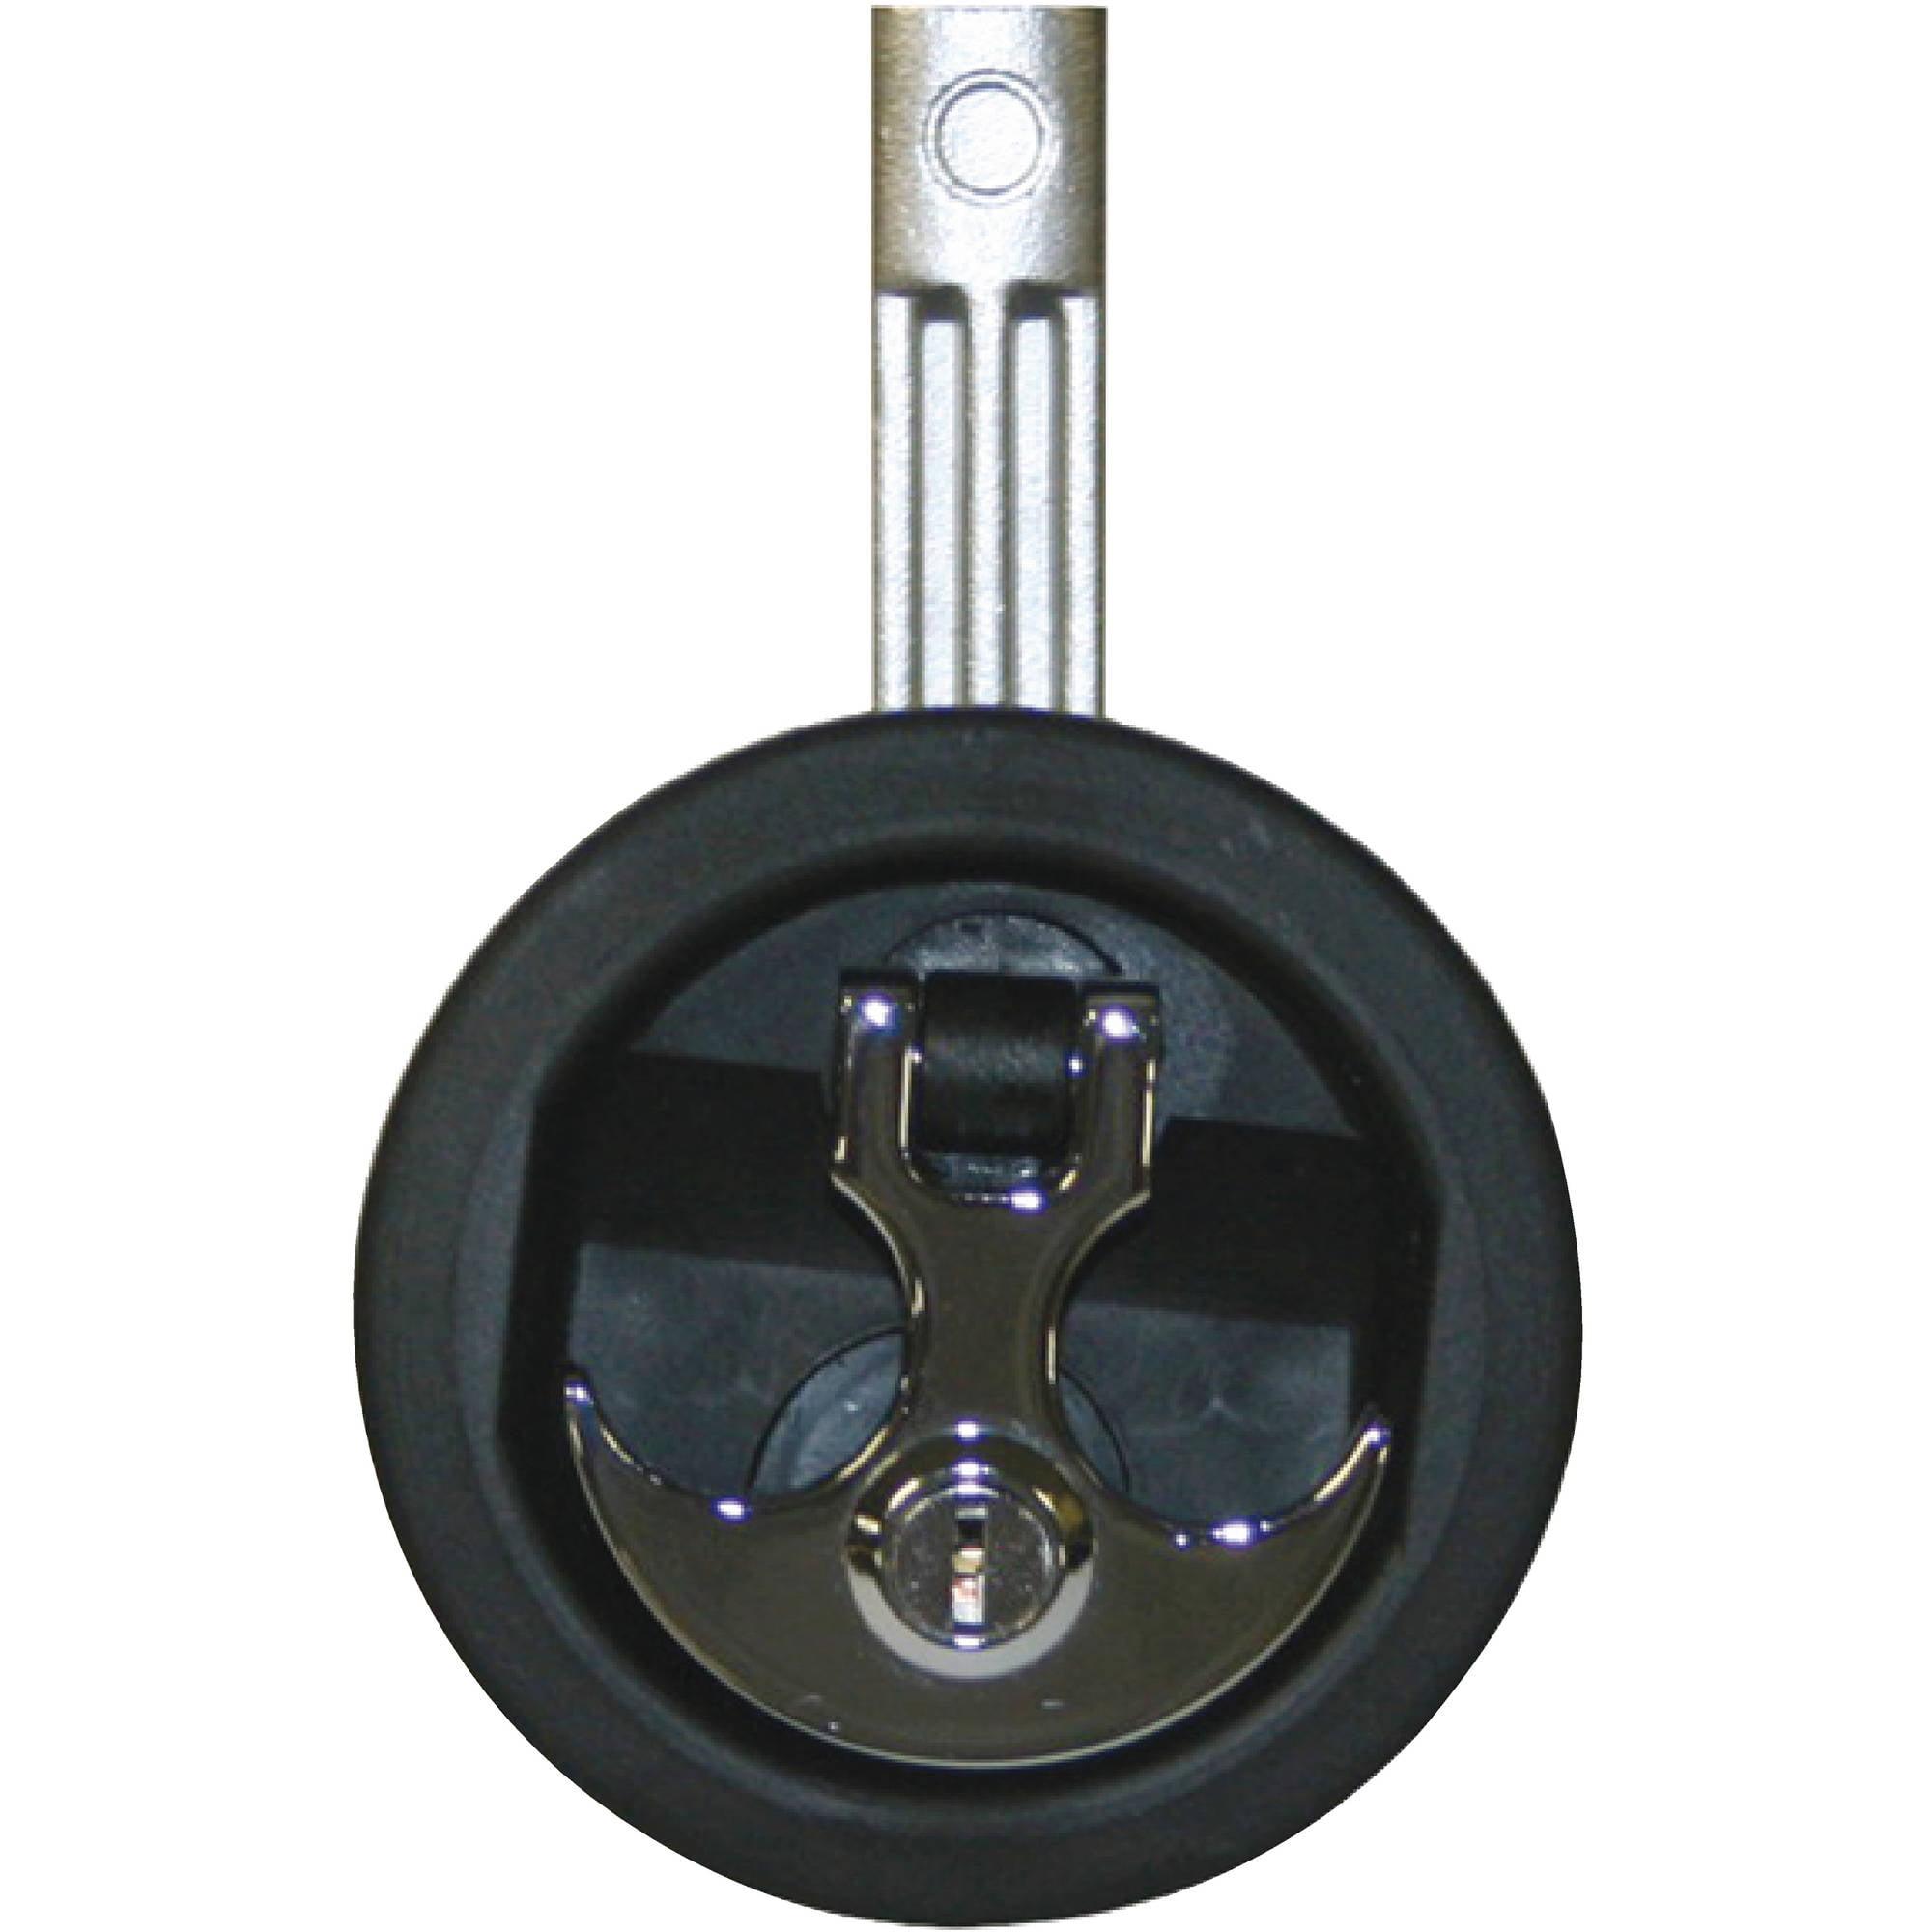 T-H Marine Locking Anchor Handle Lock, Black Body, Chrome Handle by T-H Marine Supplies